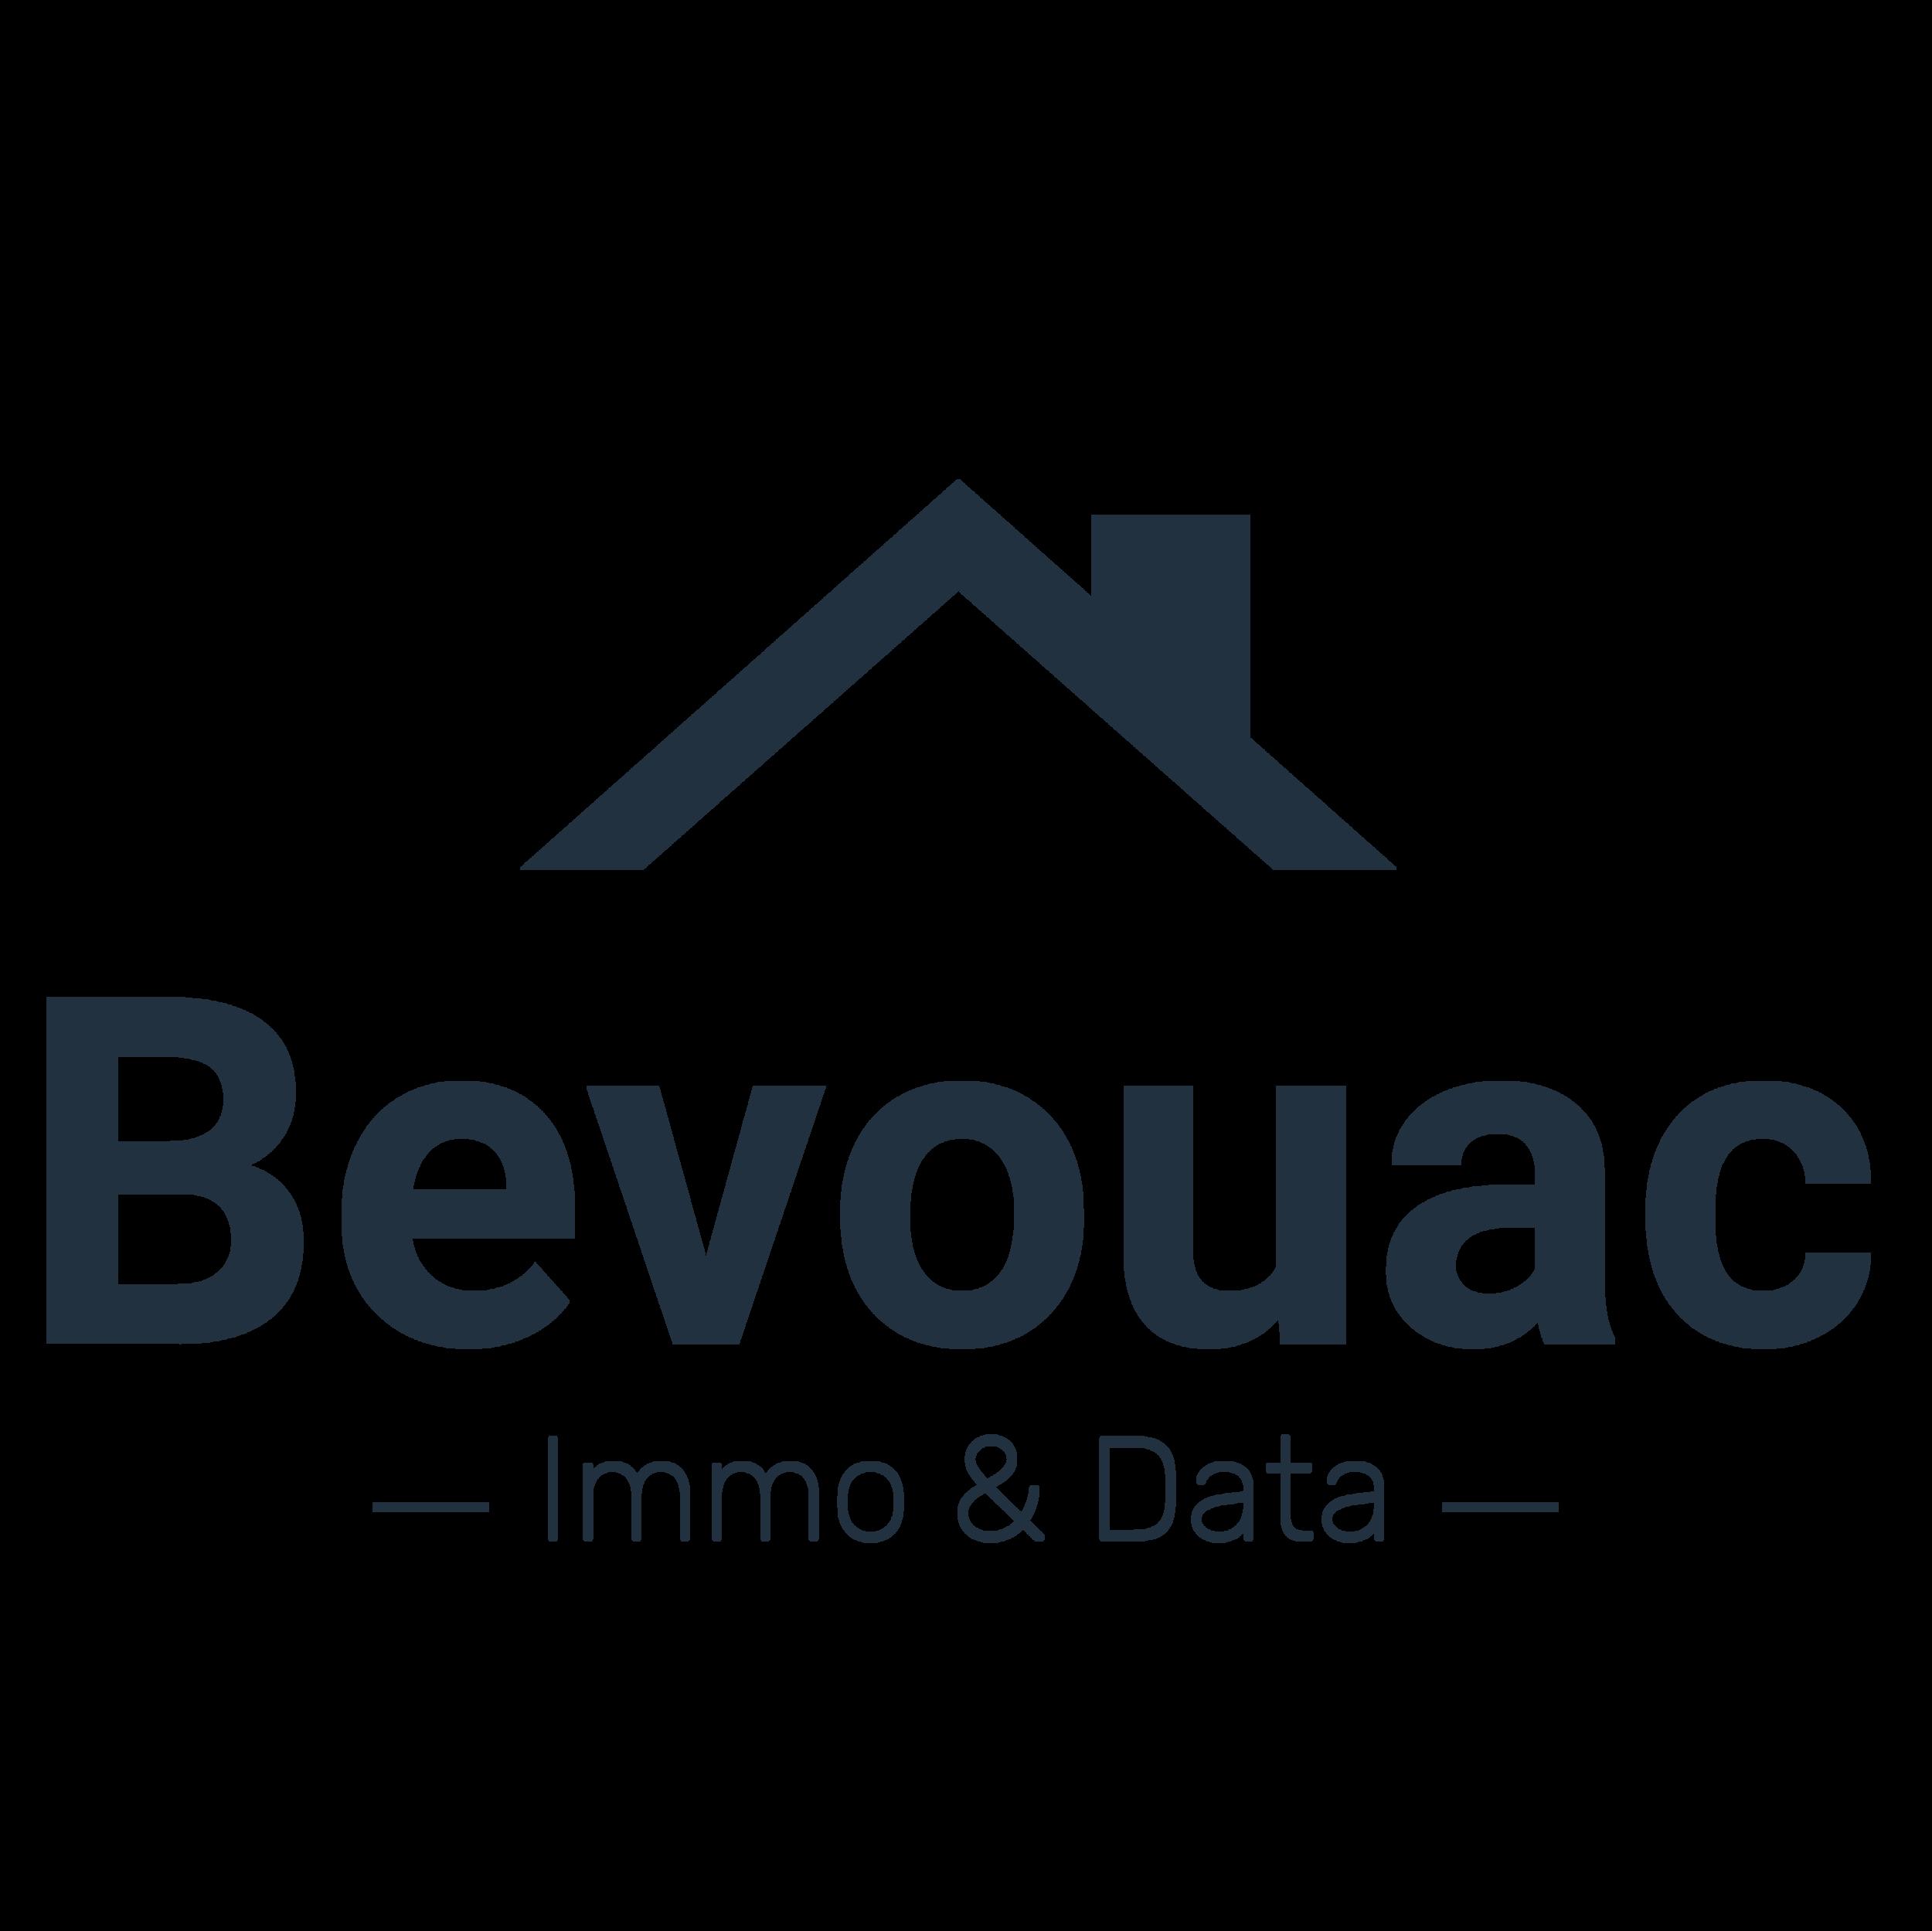 Bevouac-logo-dark-blue-square-immo-data.png